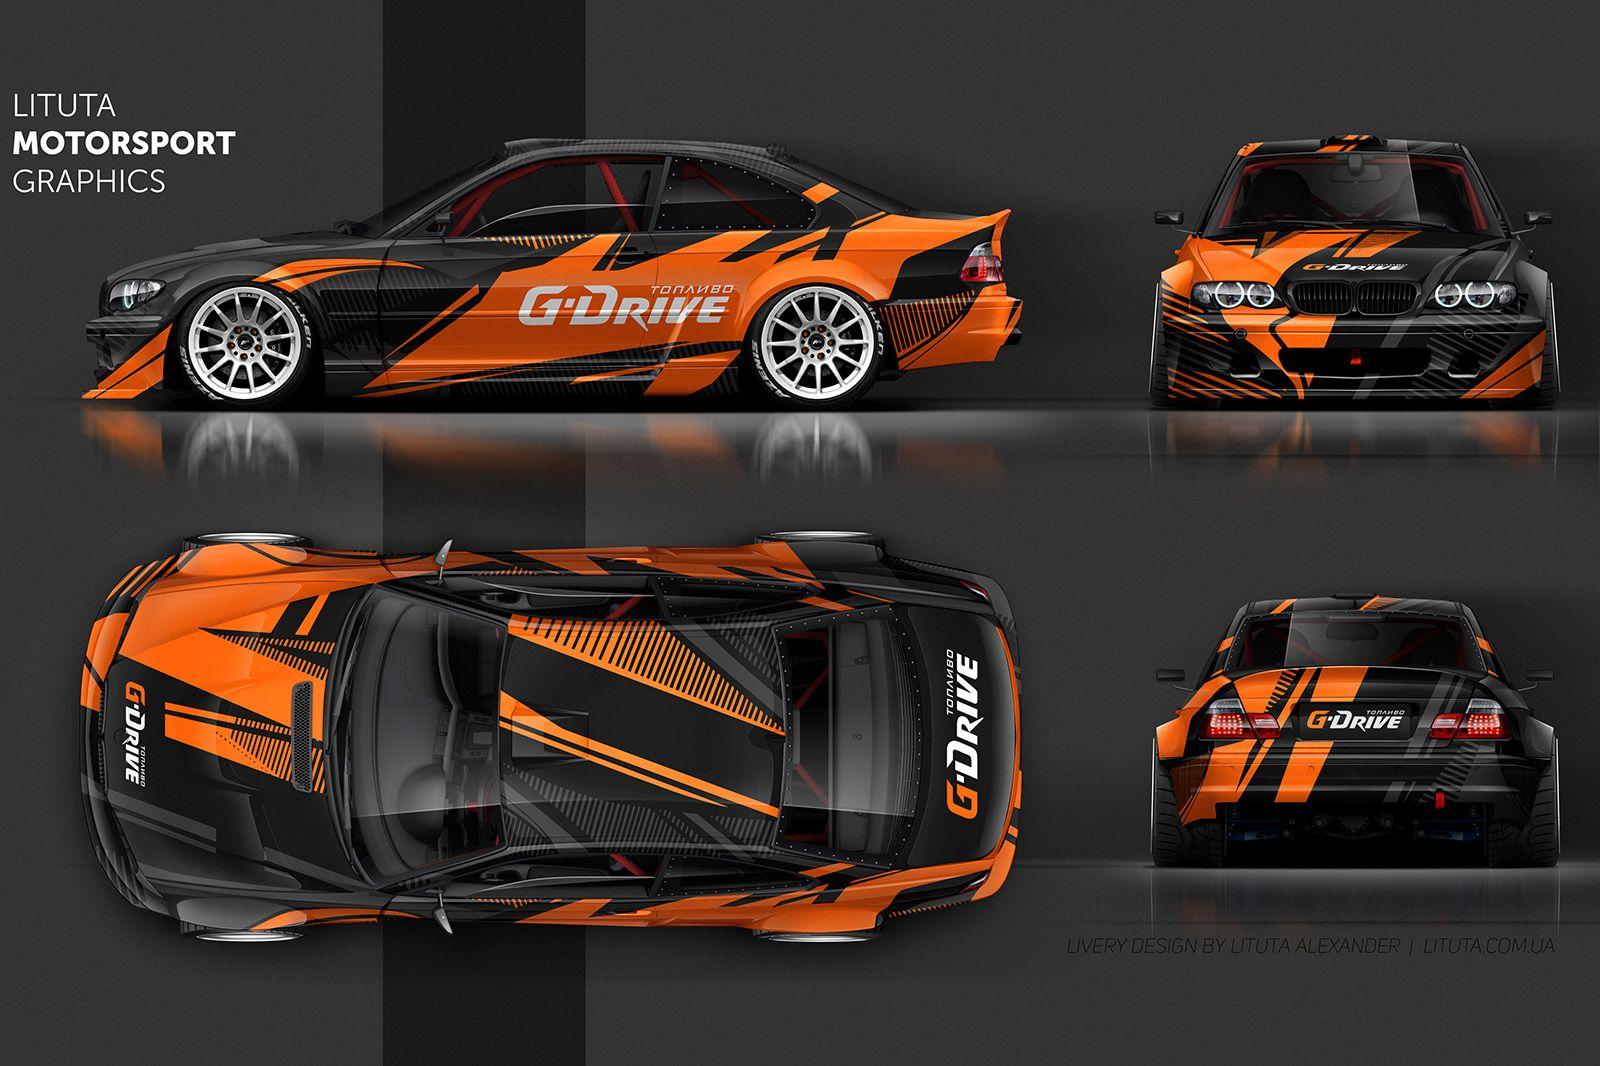 LITUTA MOTORSPORT GRAPHICS   BLOG (With images)   Car graphics